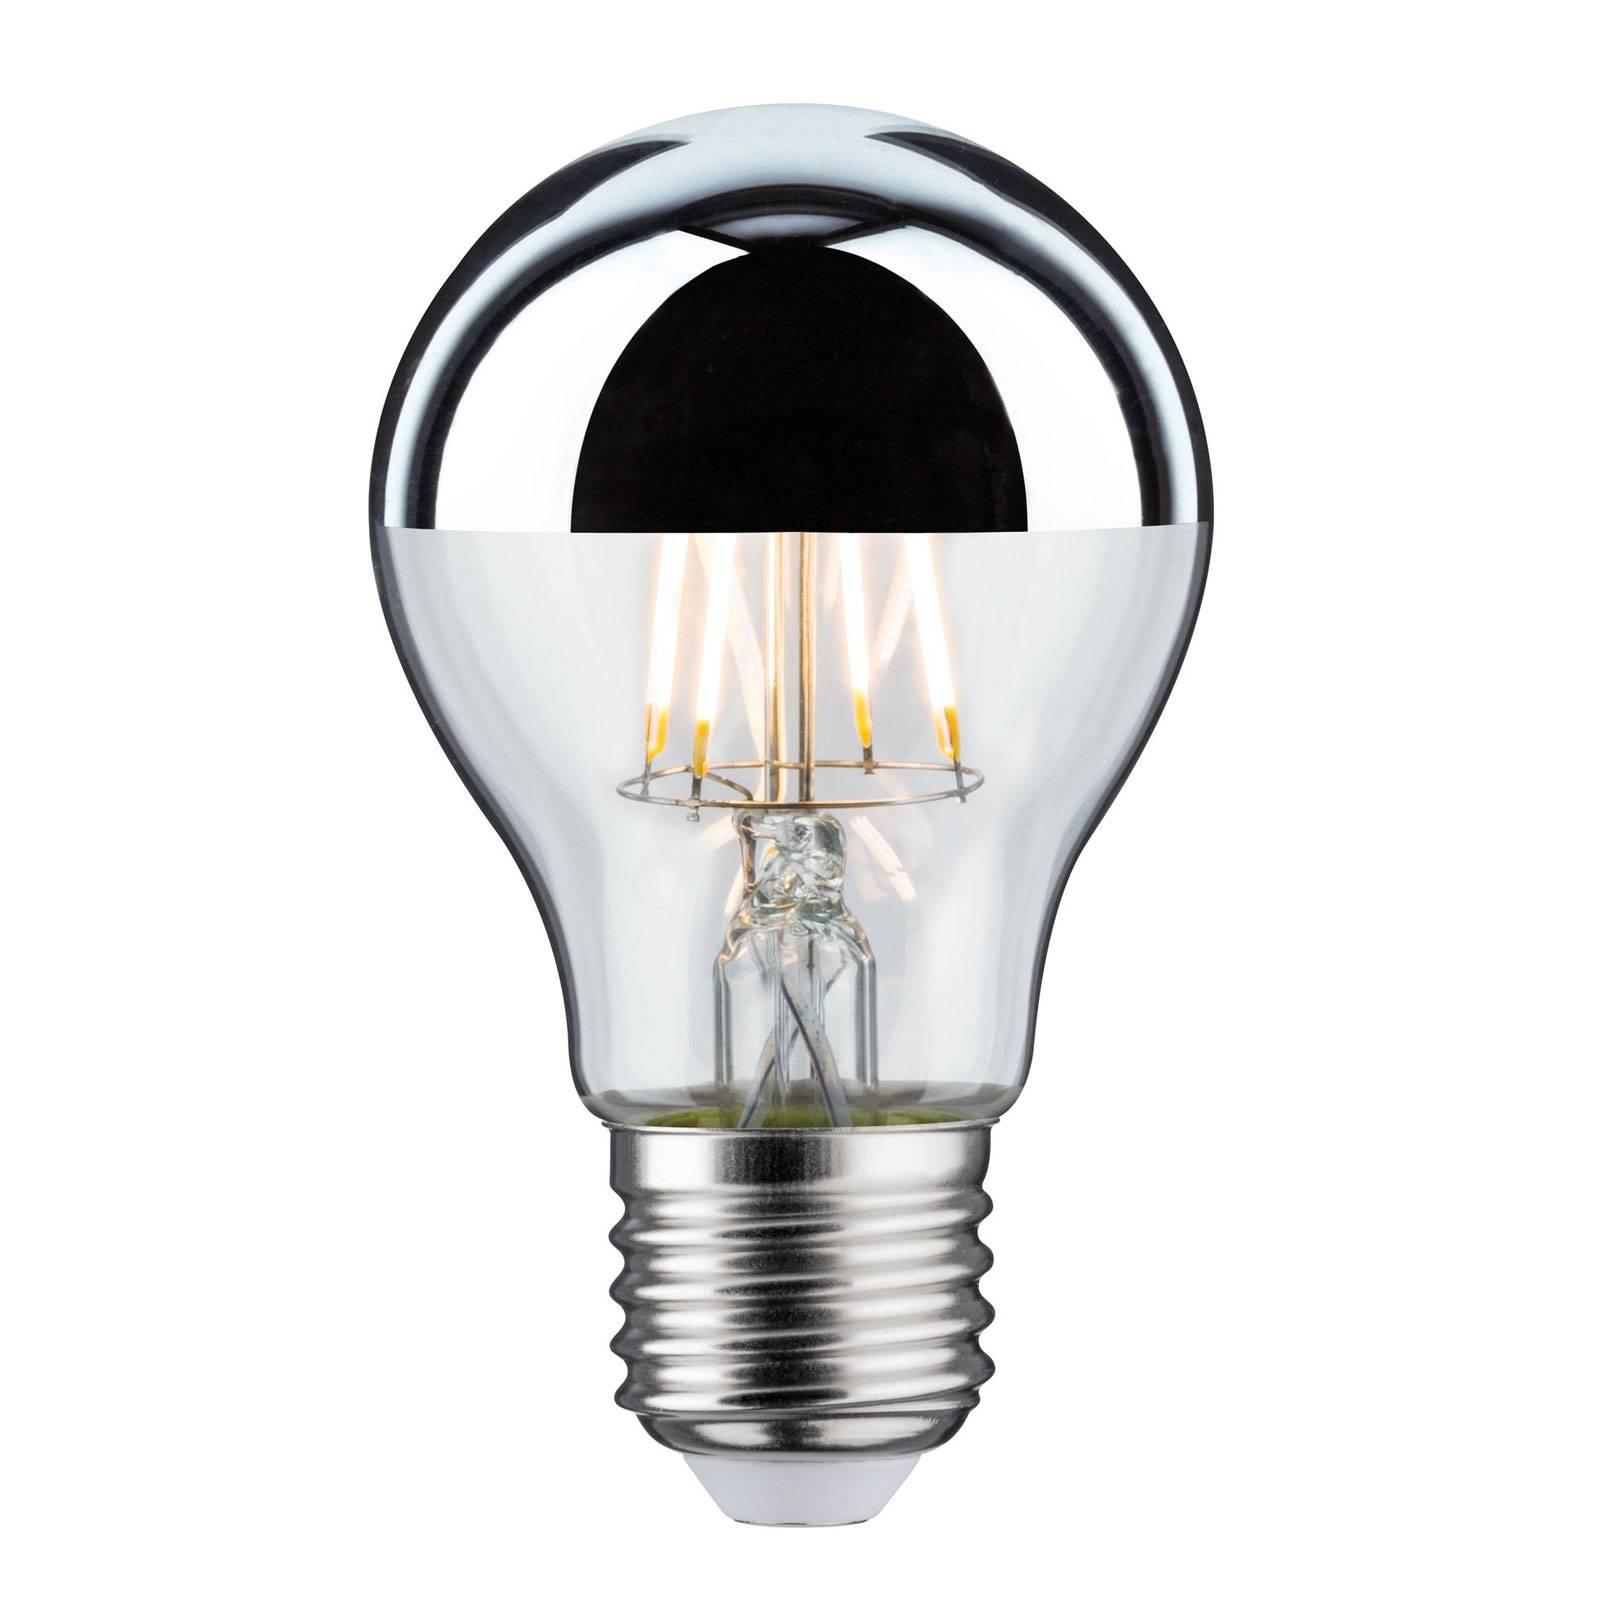 LED-lamppu E27 pisara 827 pääpeili 6,5 W